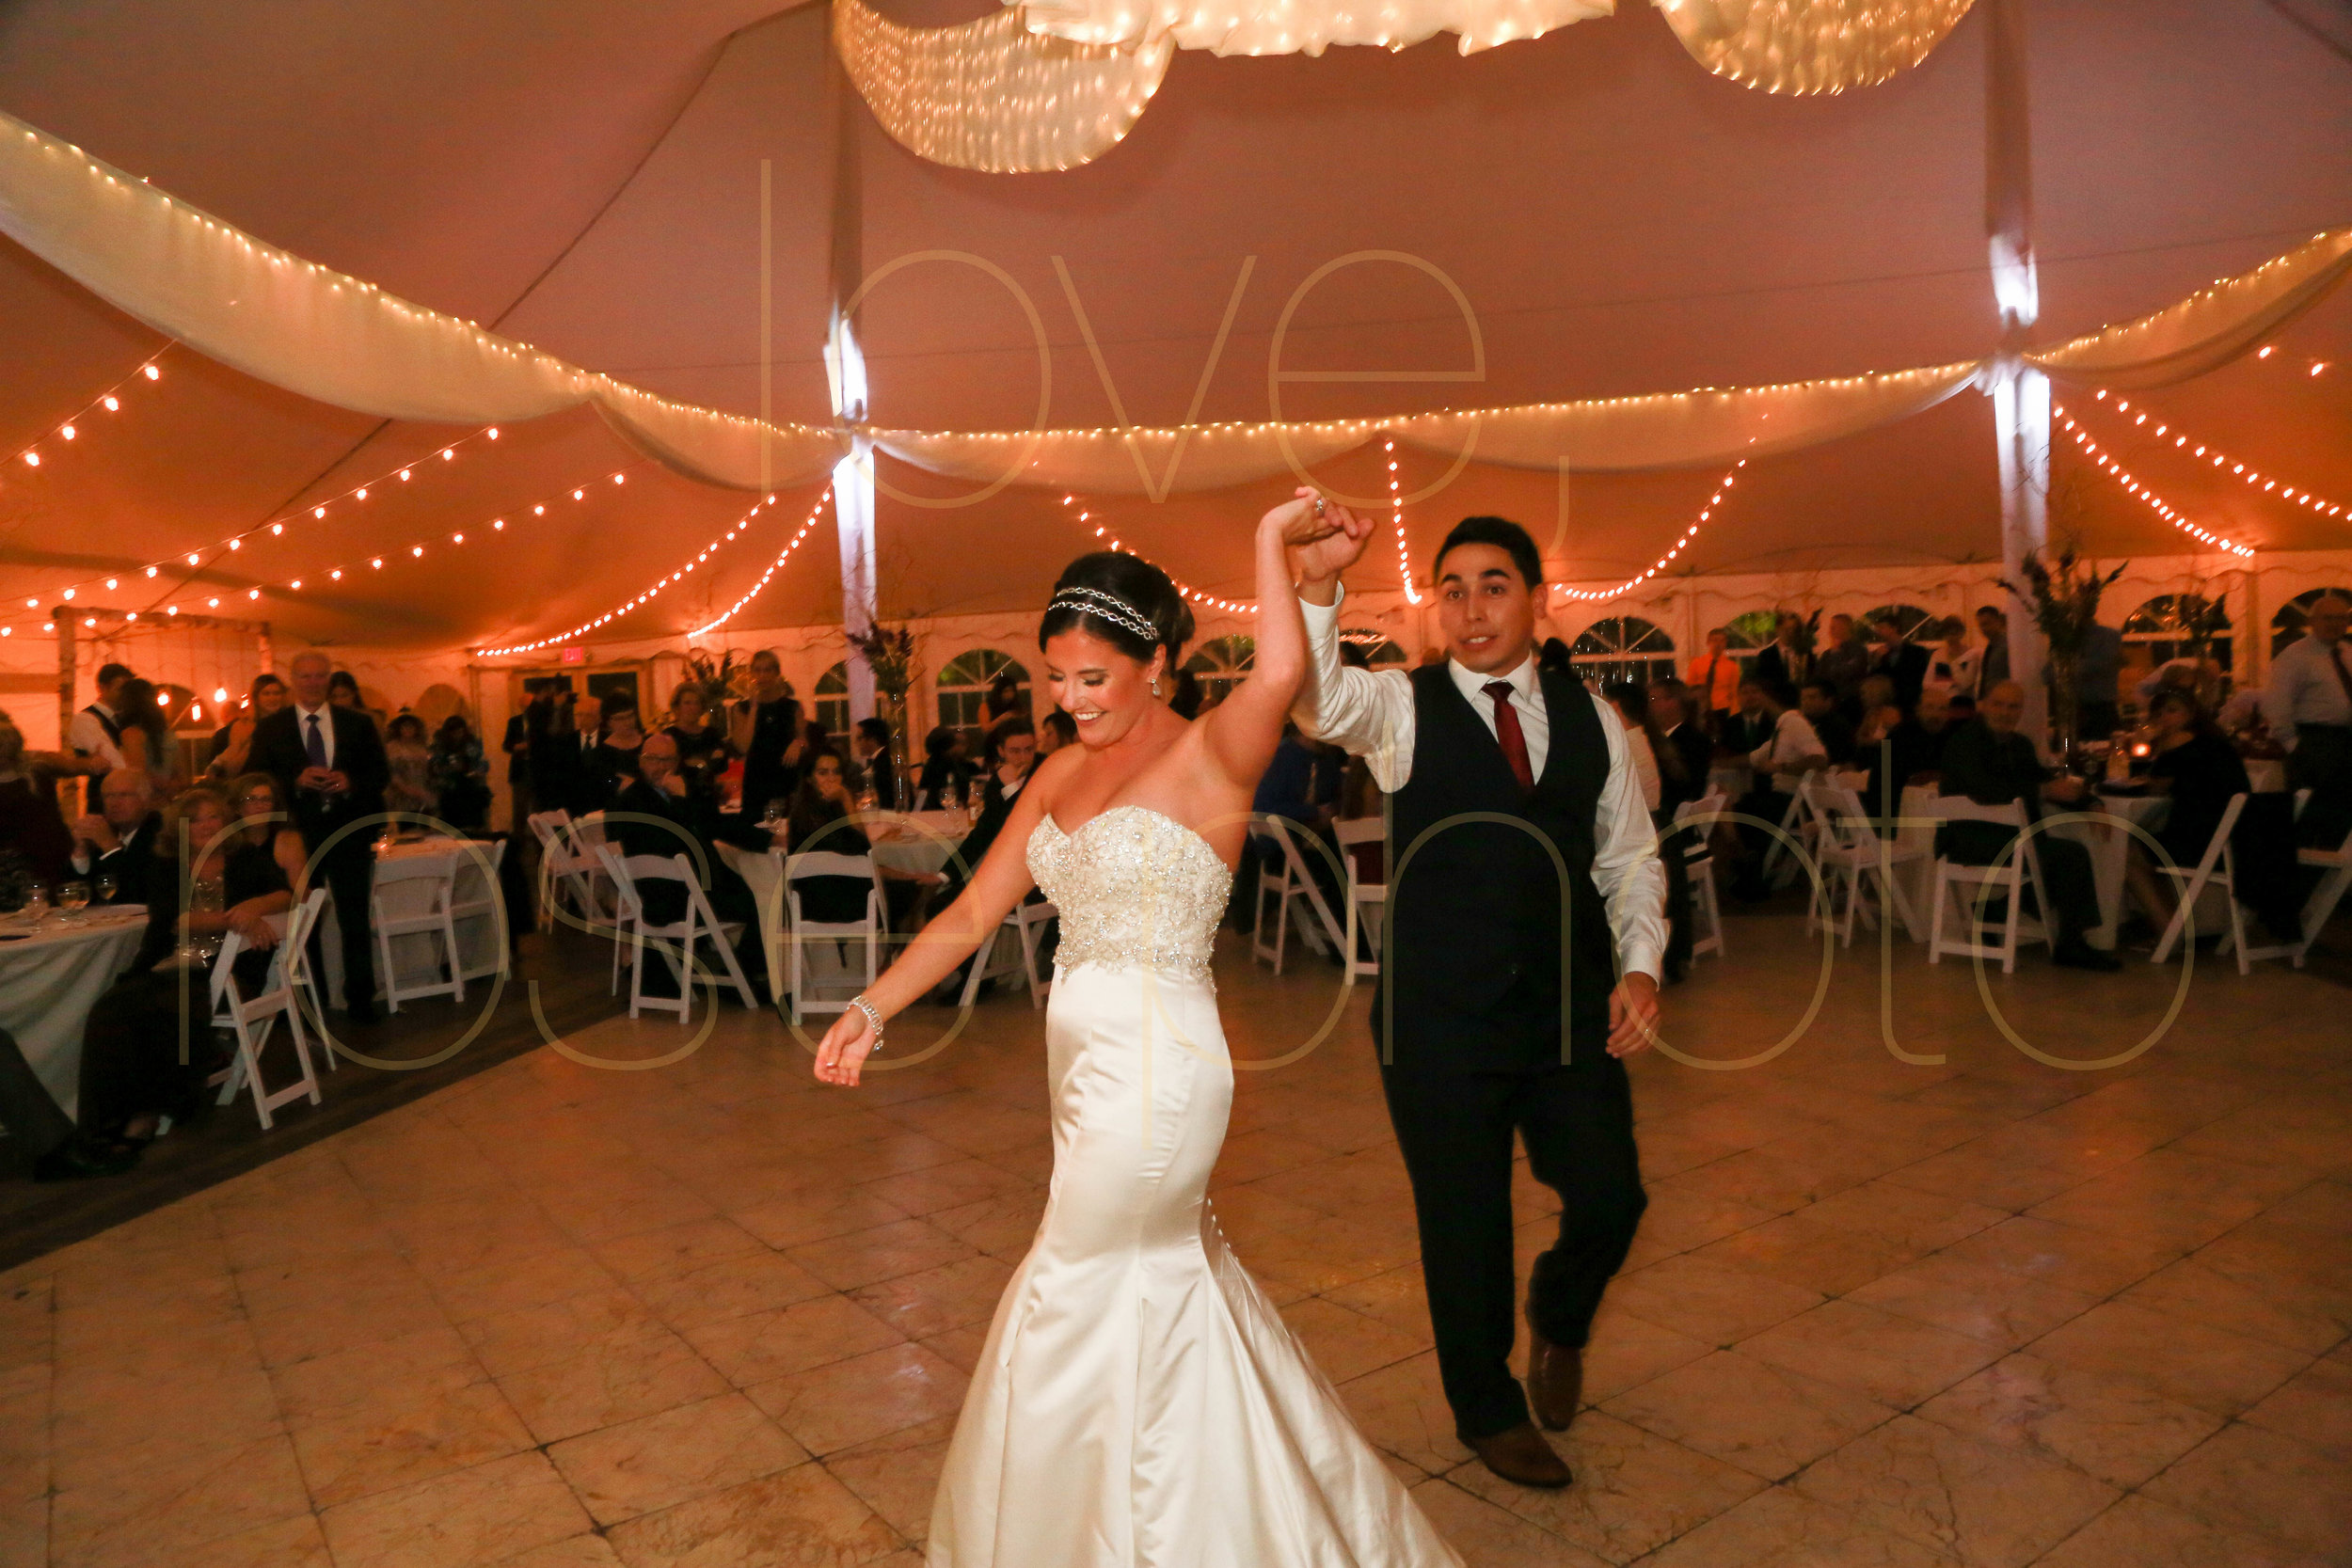 Alison + Mike Chicago Wedding Photographer Blog -22.jpg